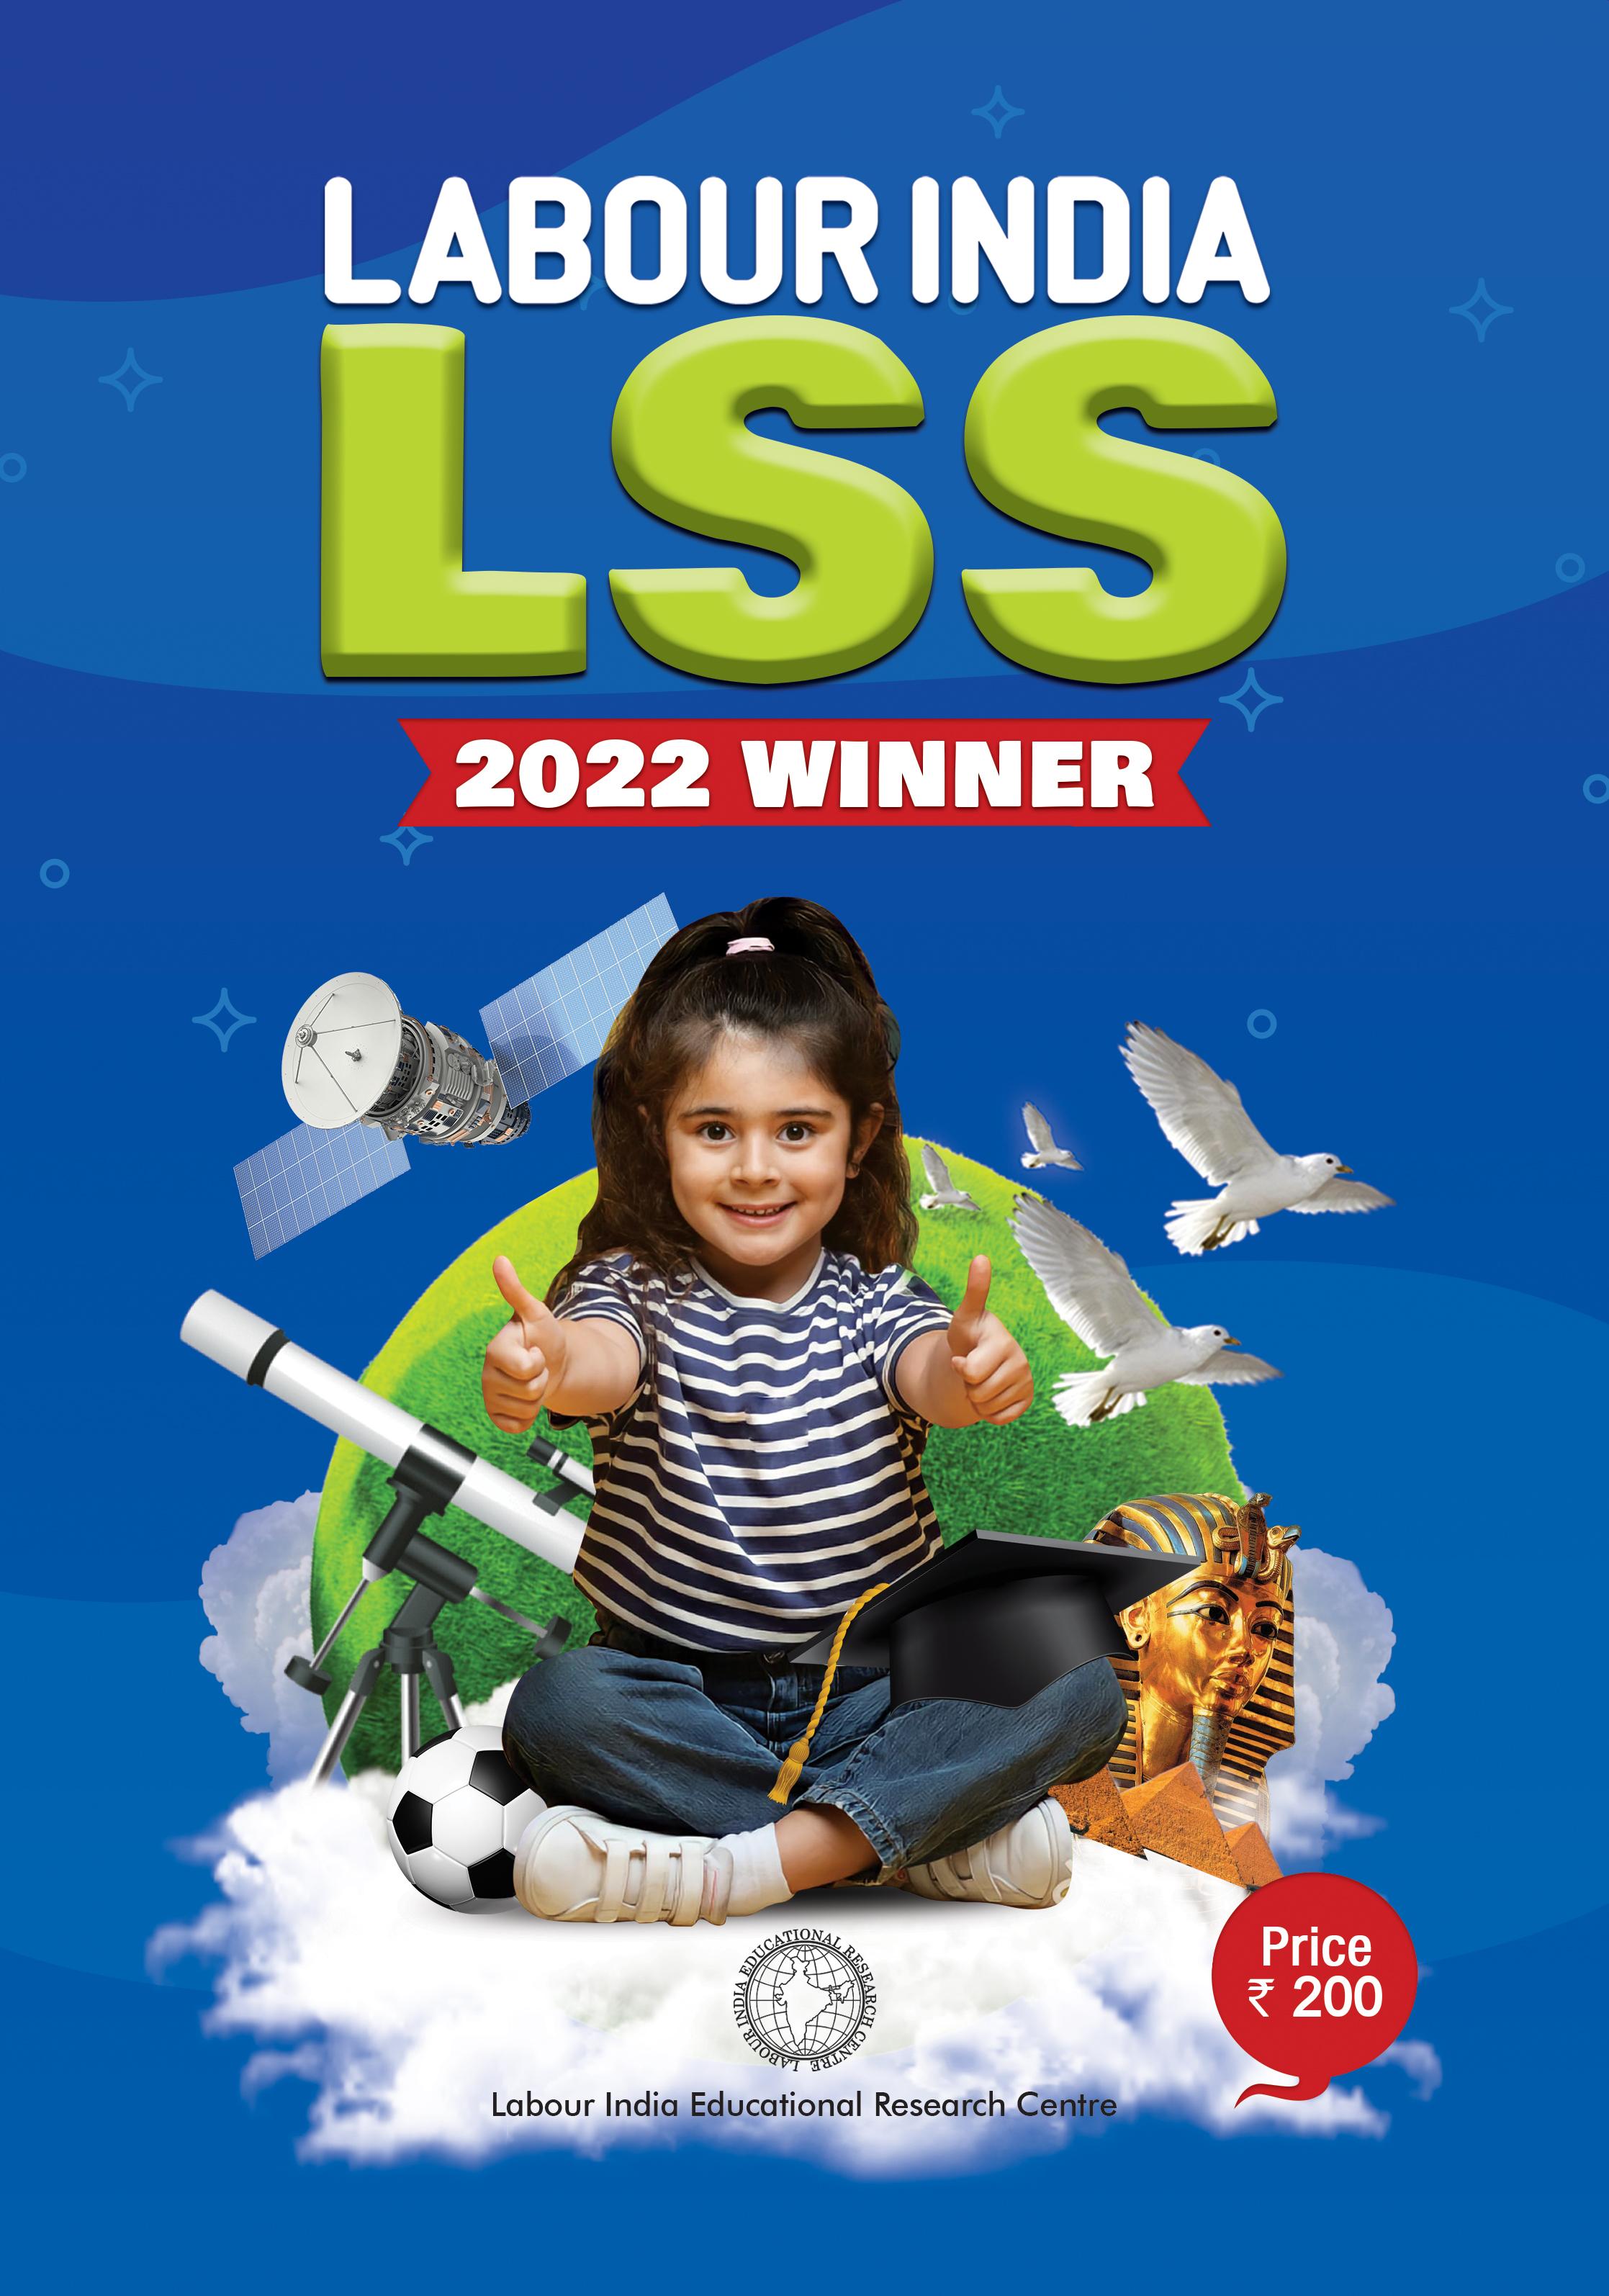 Labour India, LSS Winner 2022, English Medium